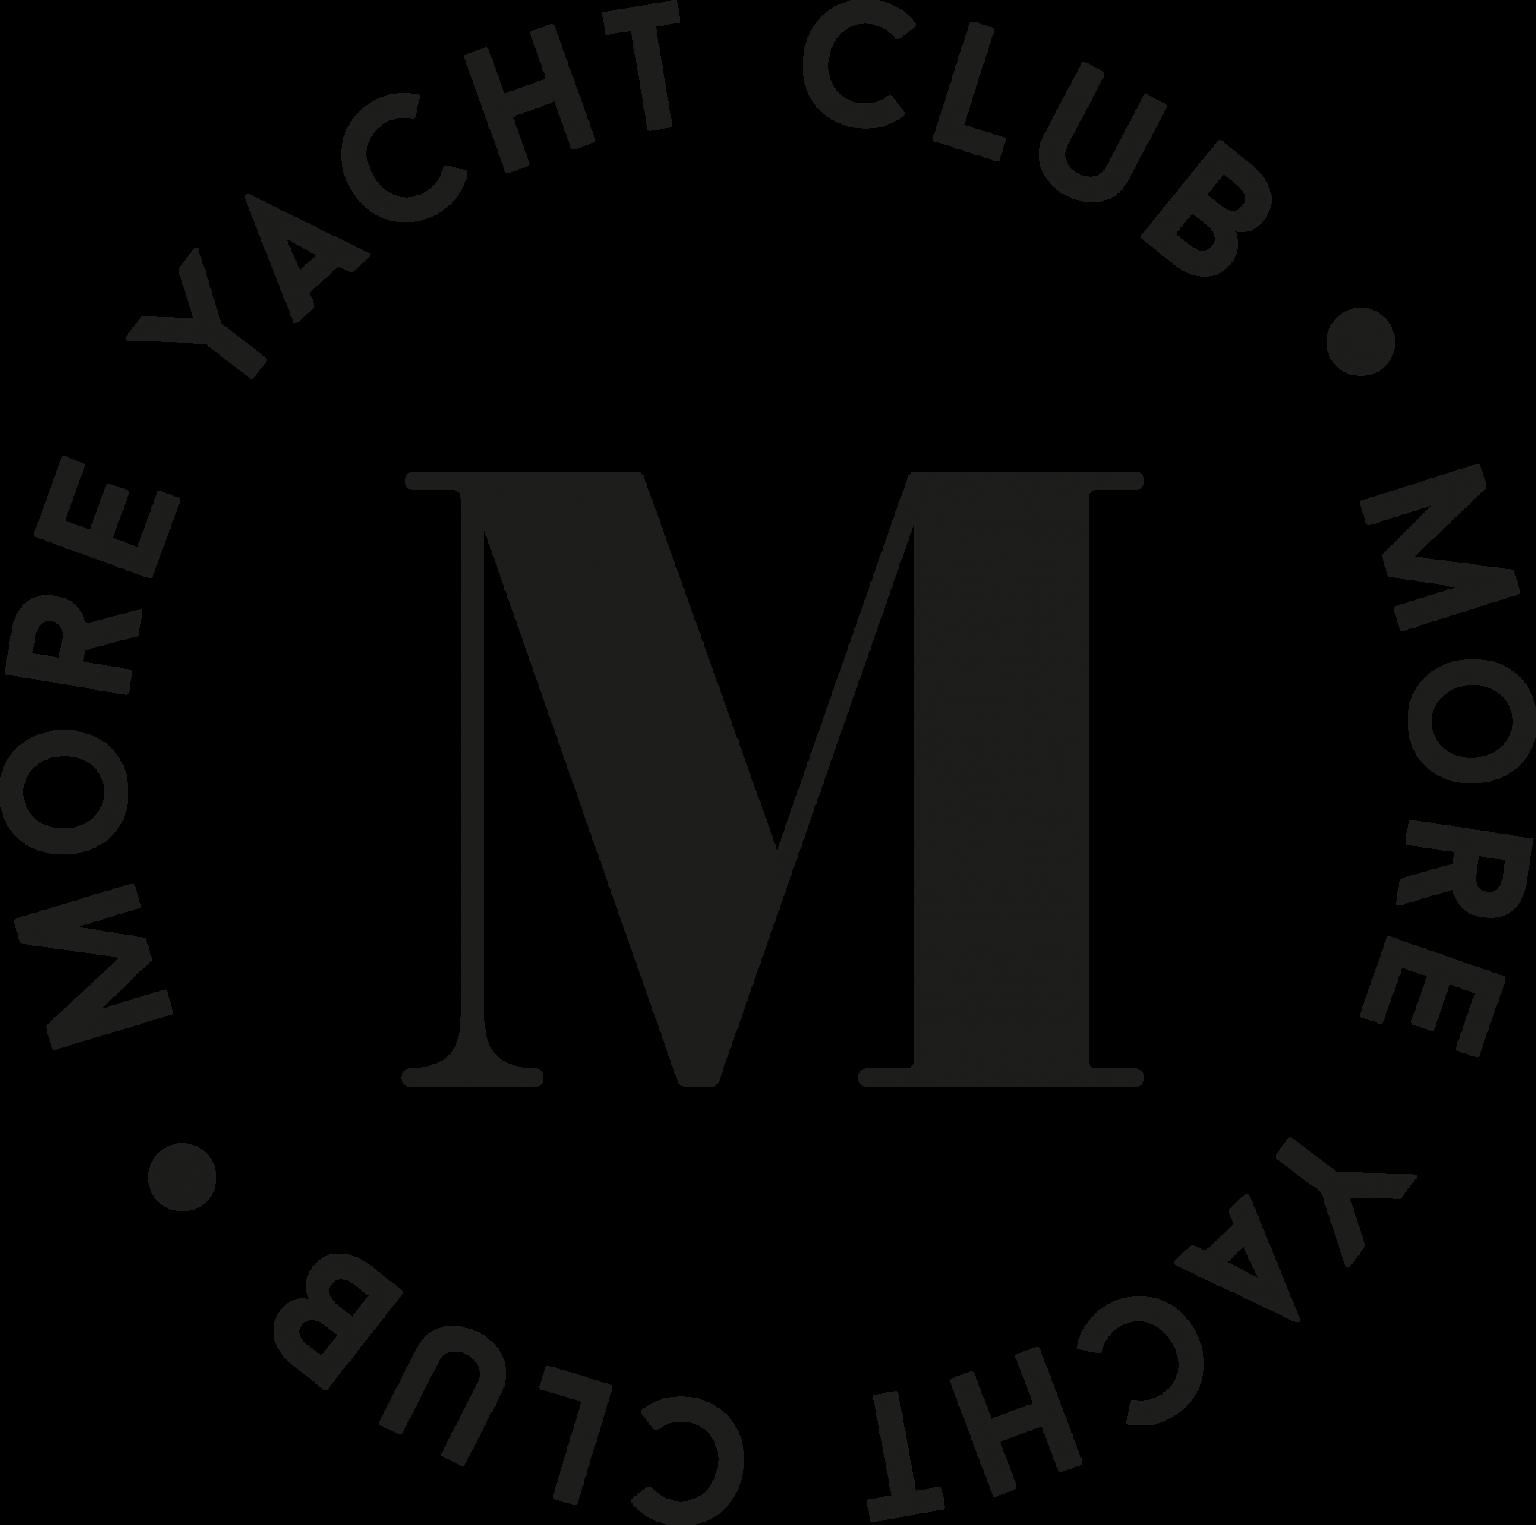 More Yacht Club